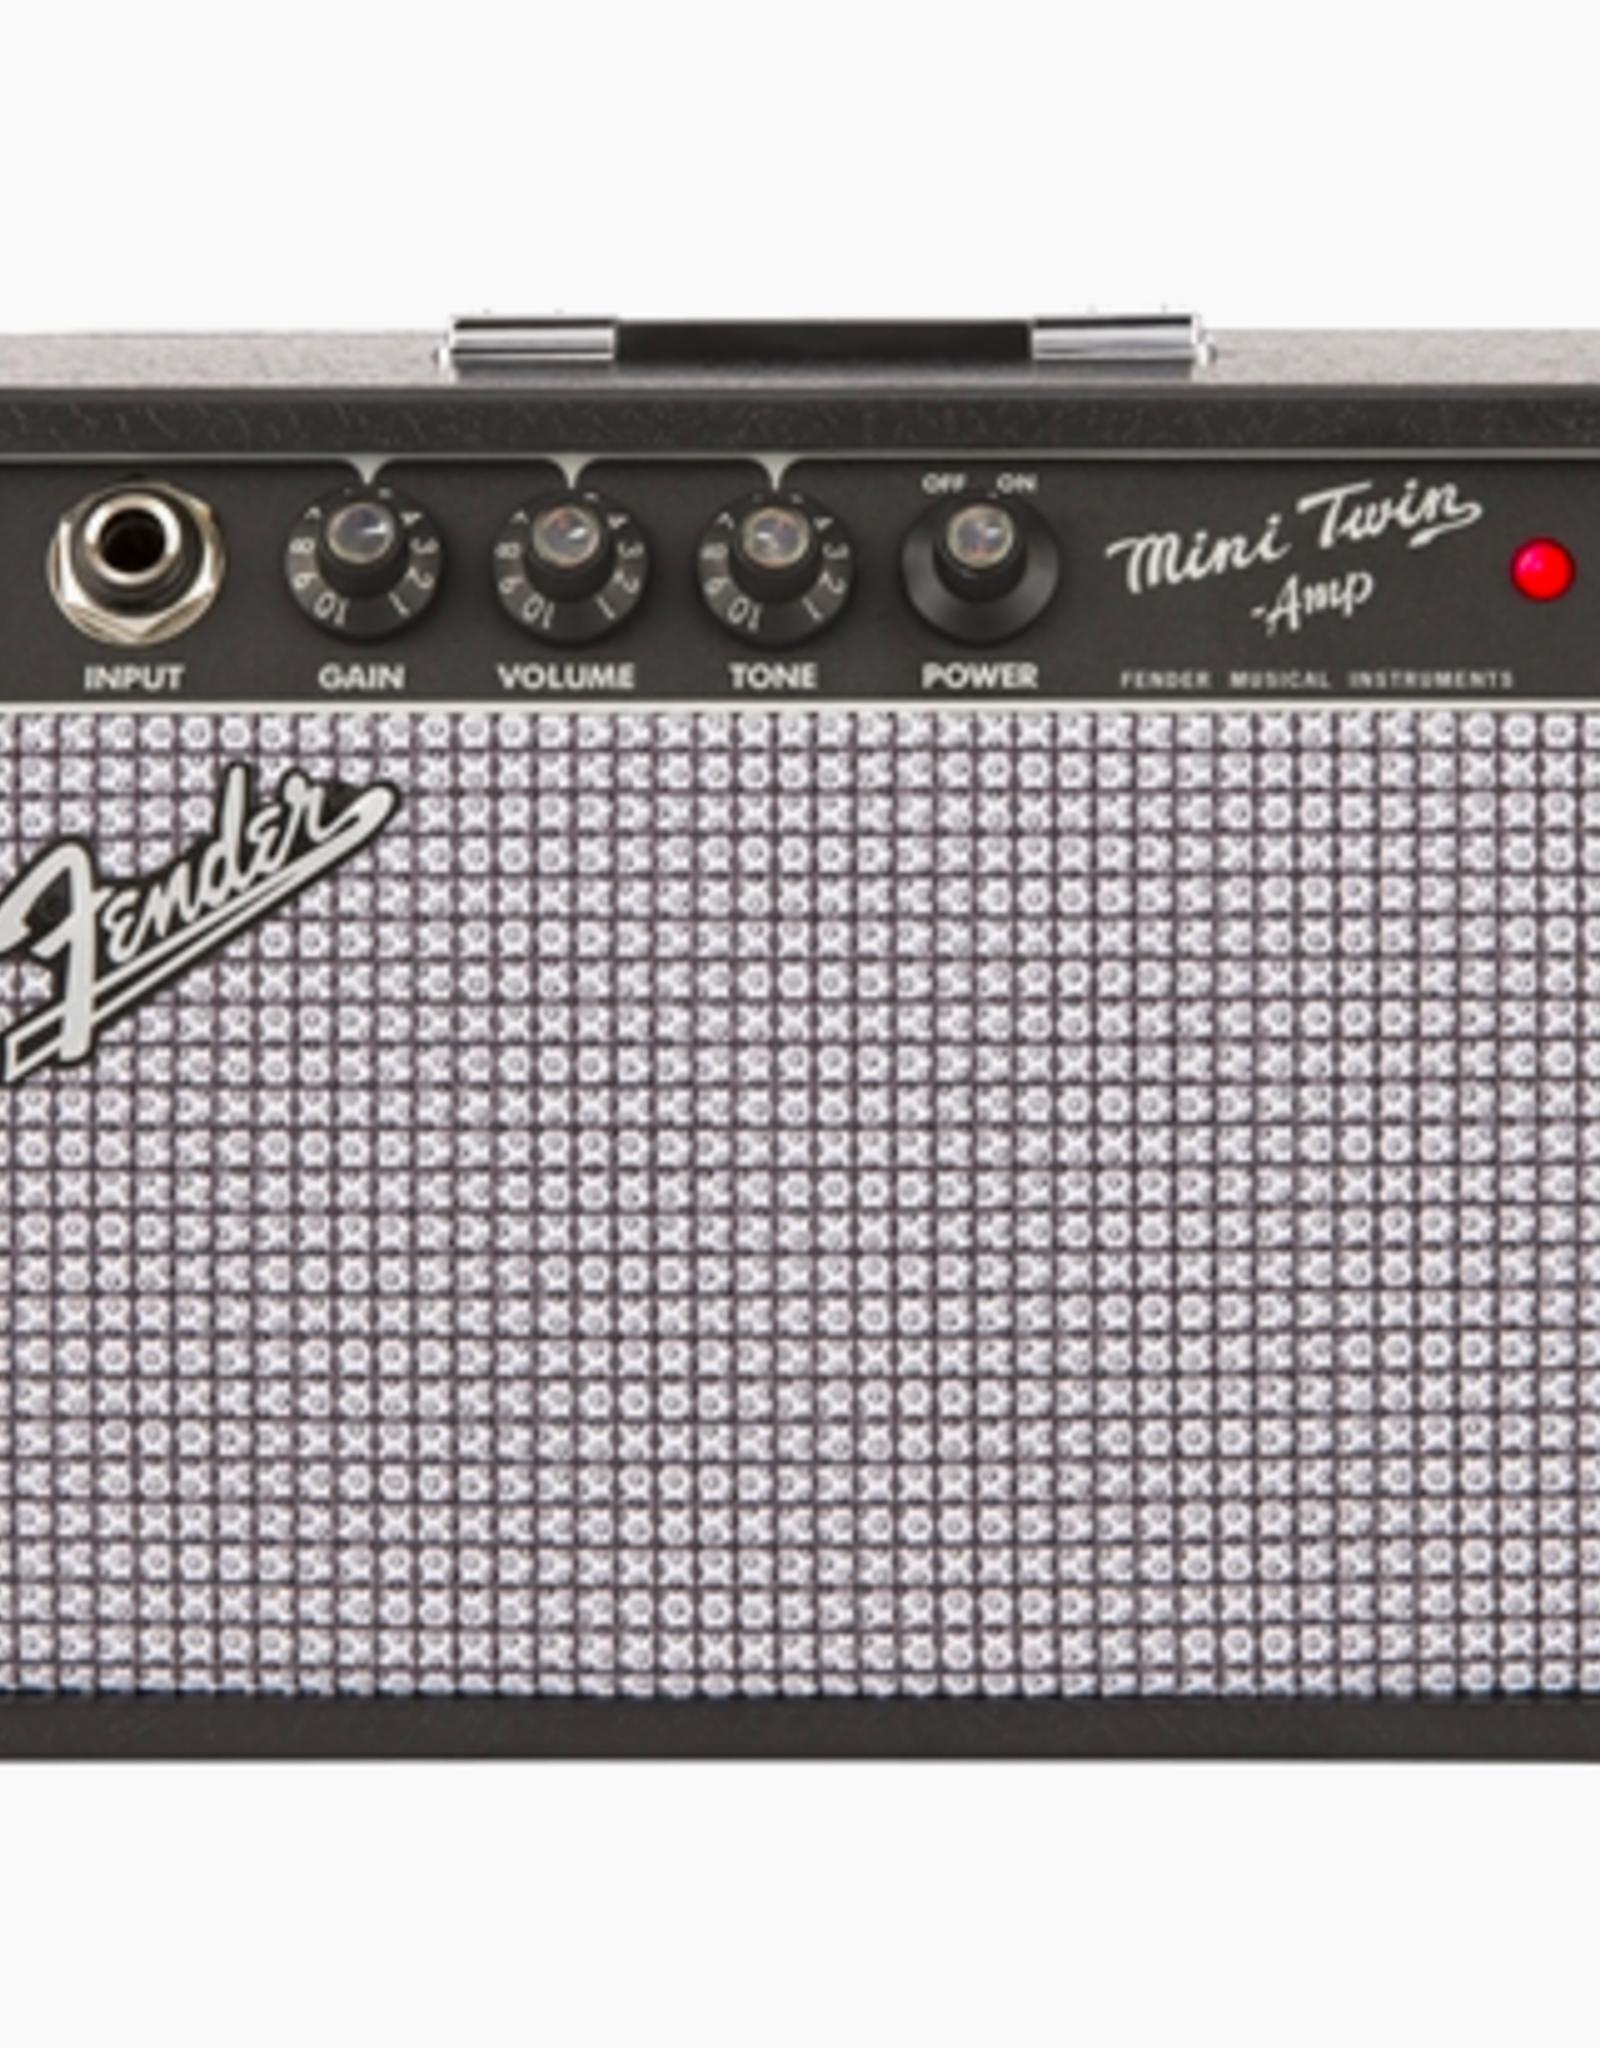 Fender Fender Mini '65 Twin-Amp